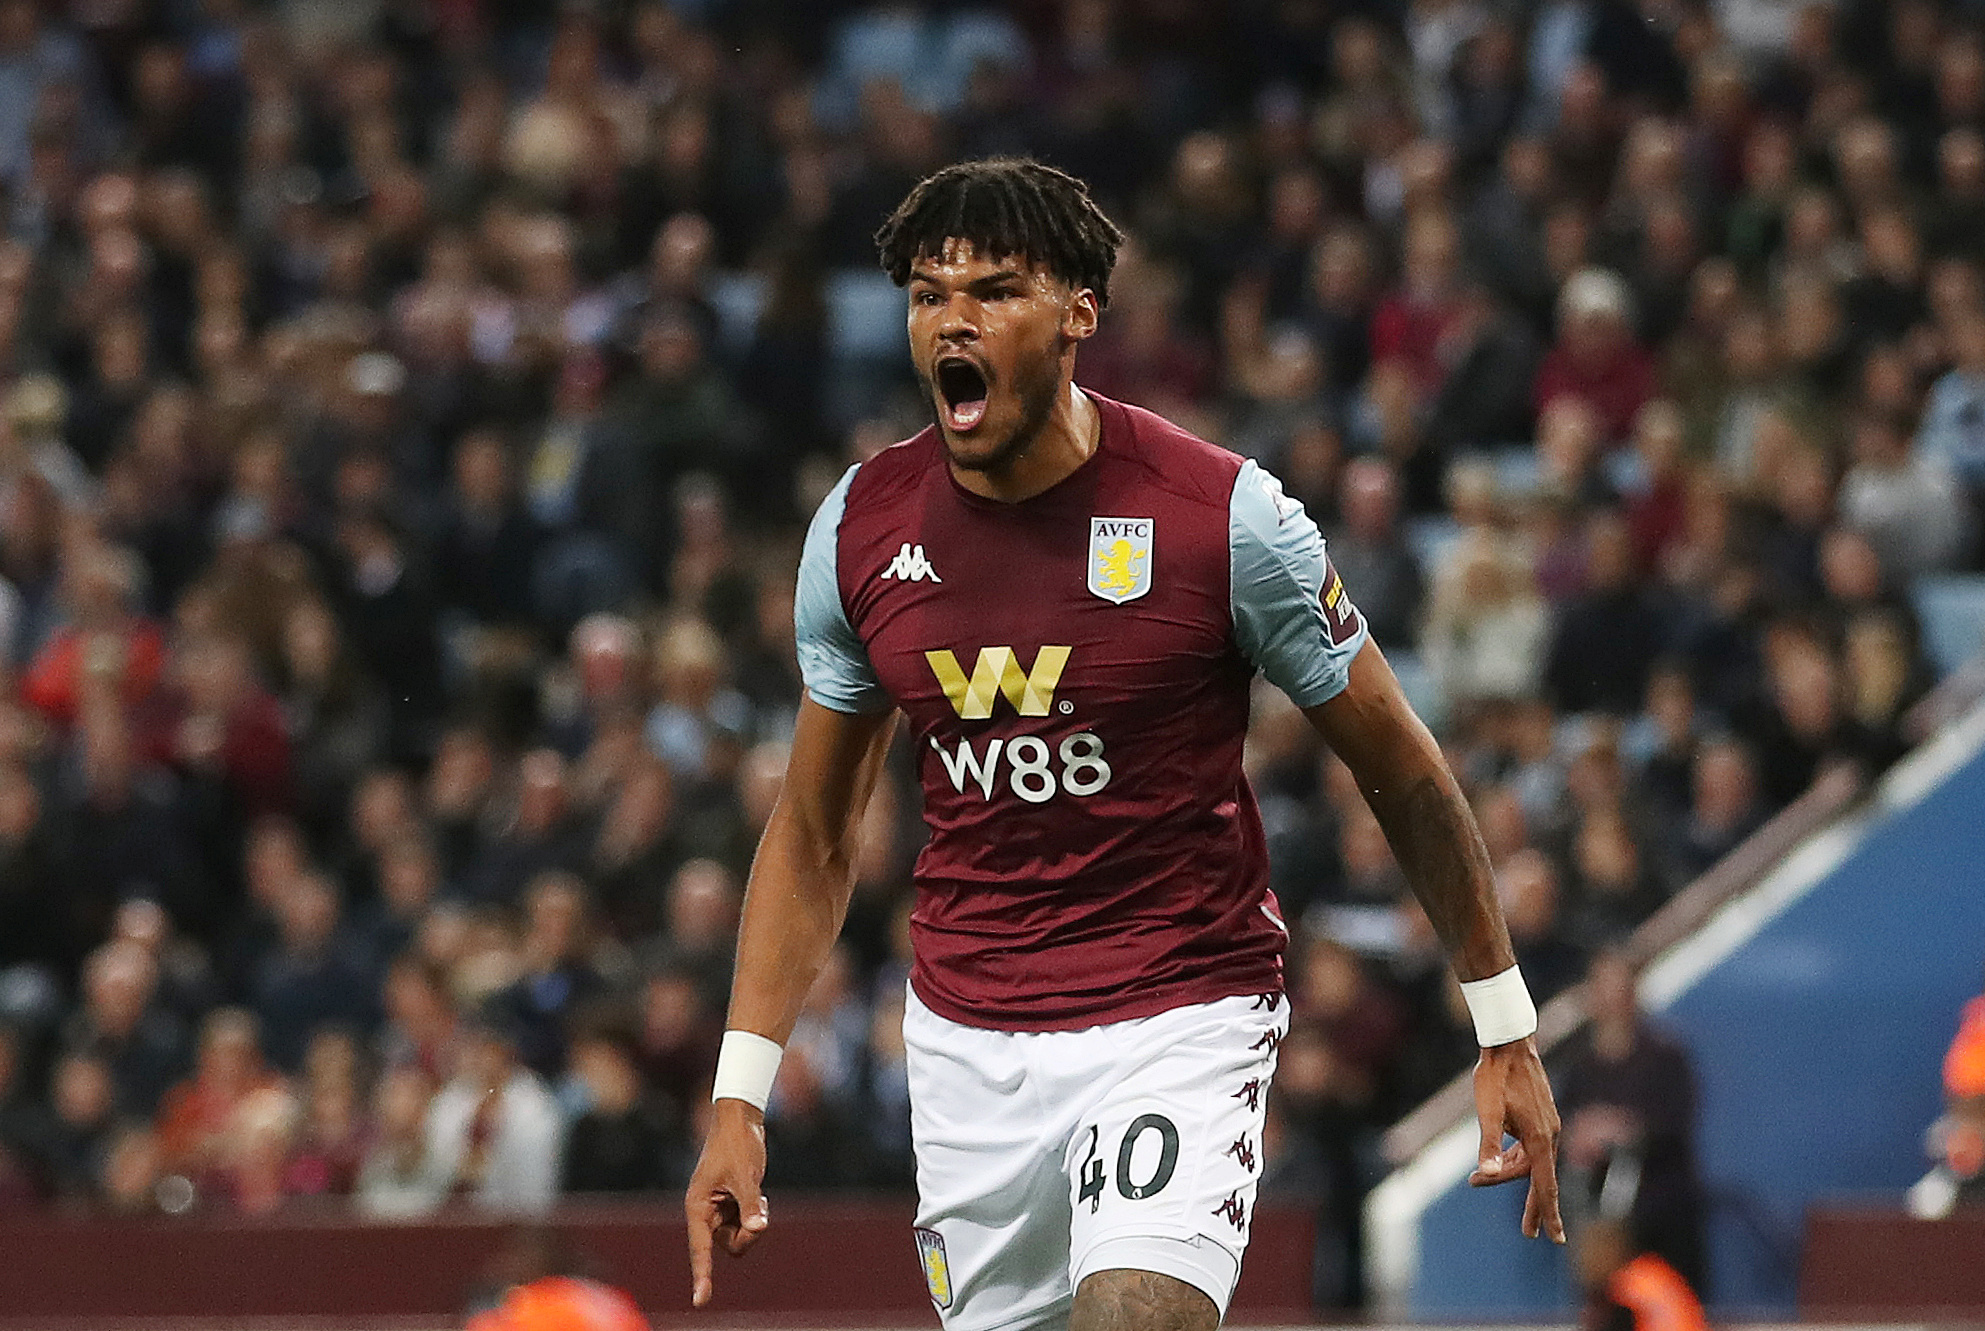 Aston Villa FC Defenders 2019/20: Tyrone Mings